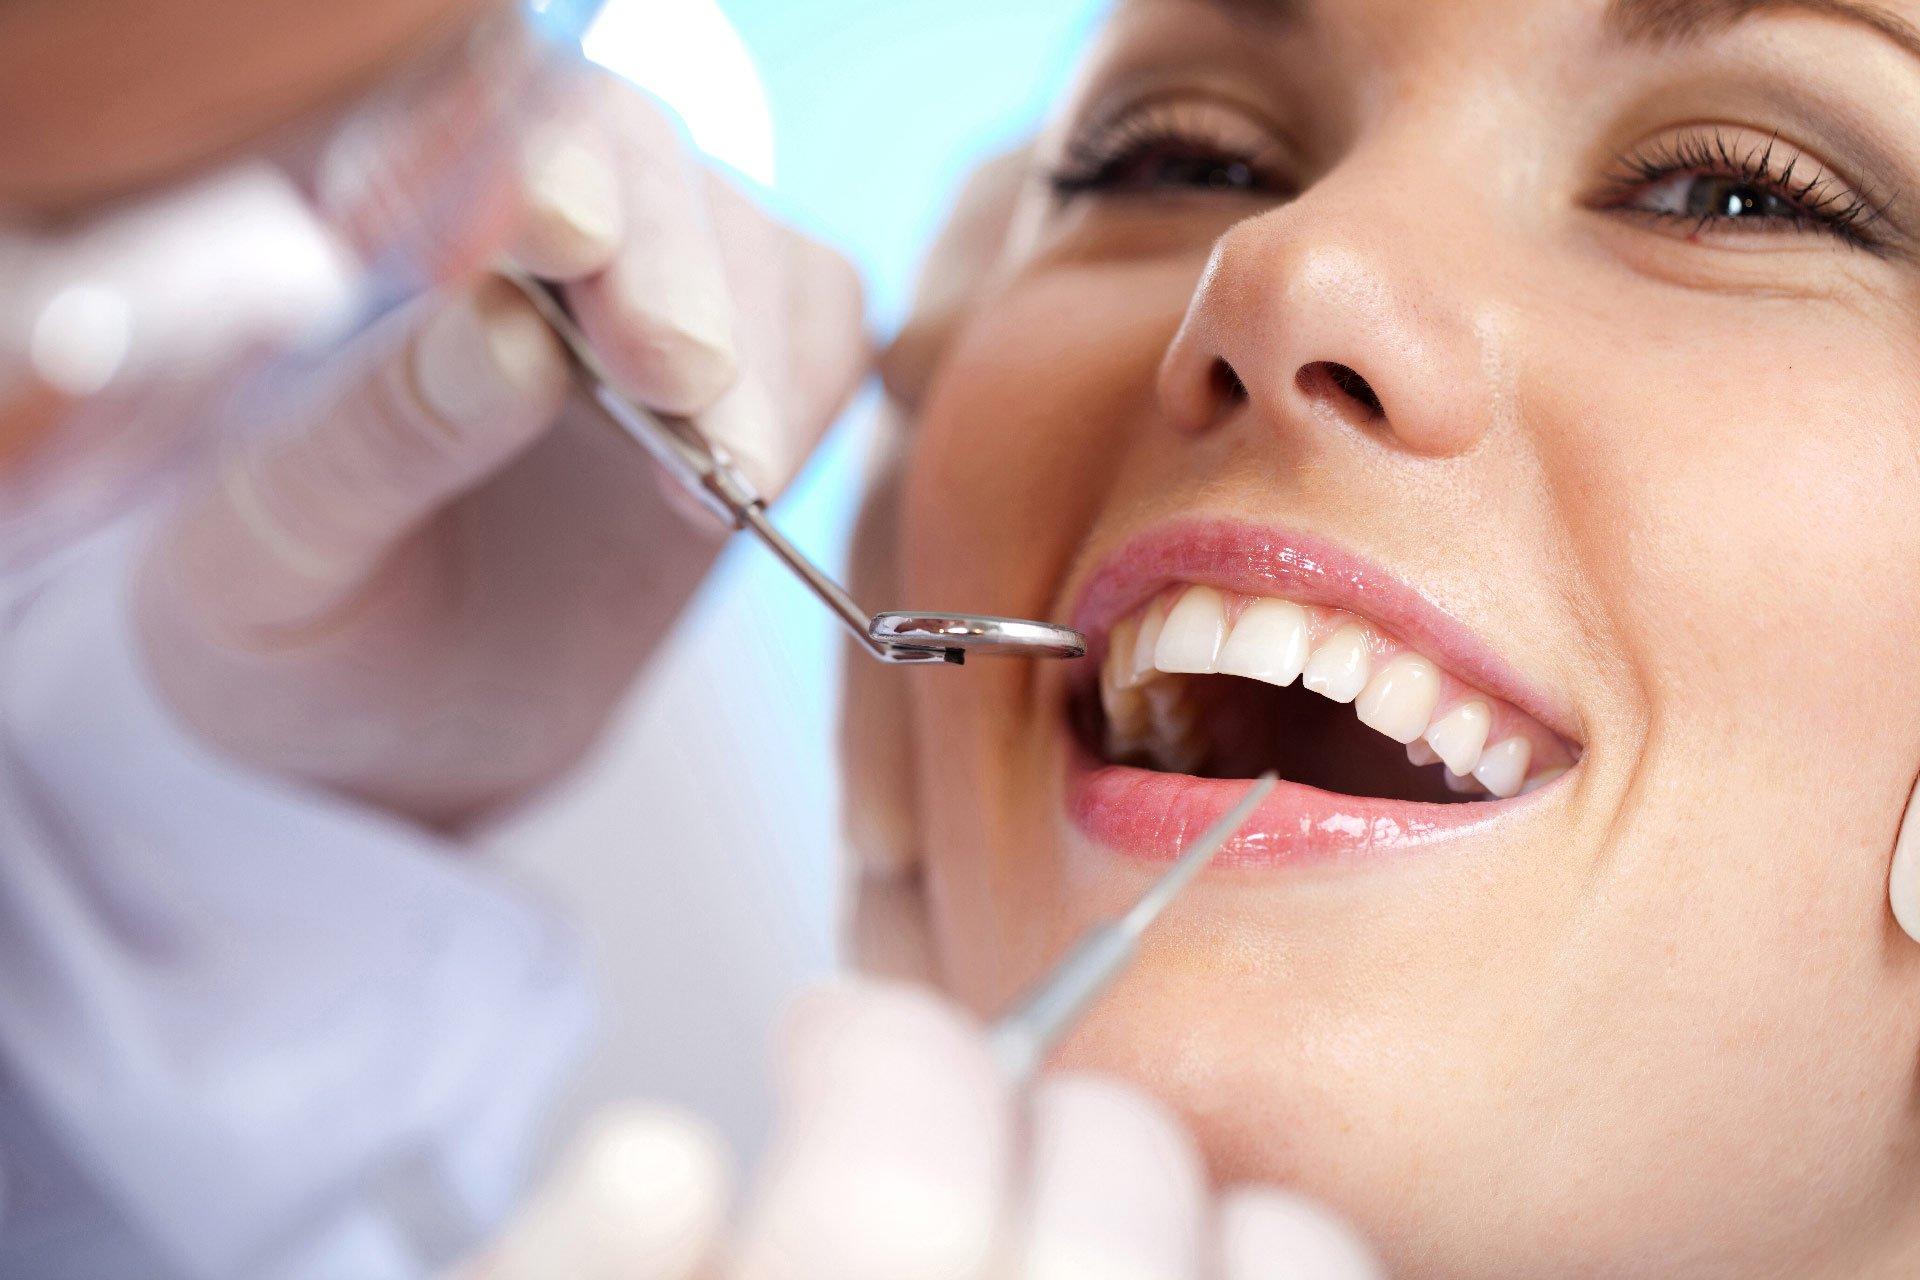 women getting teeth fixed